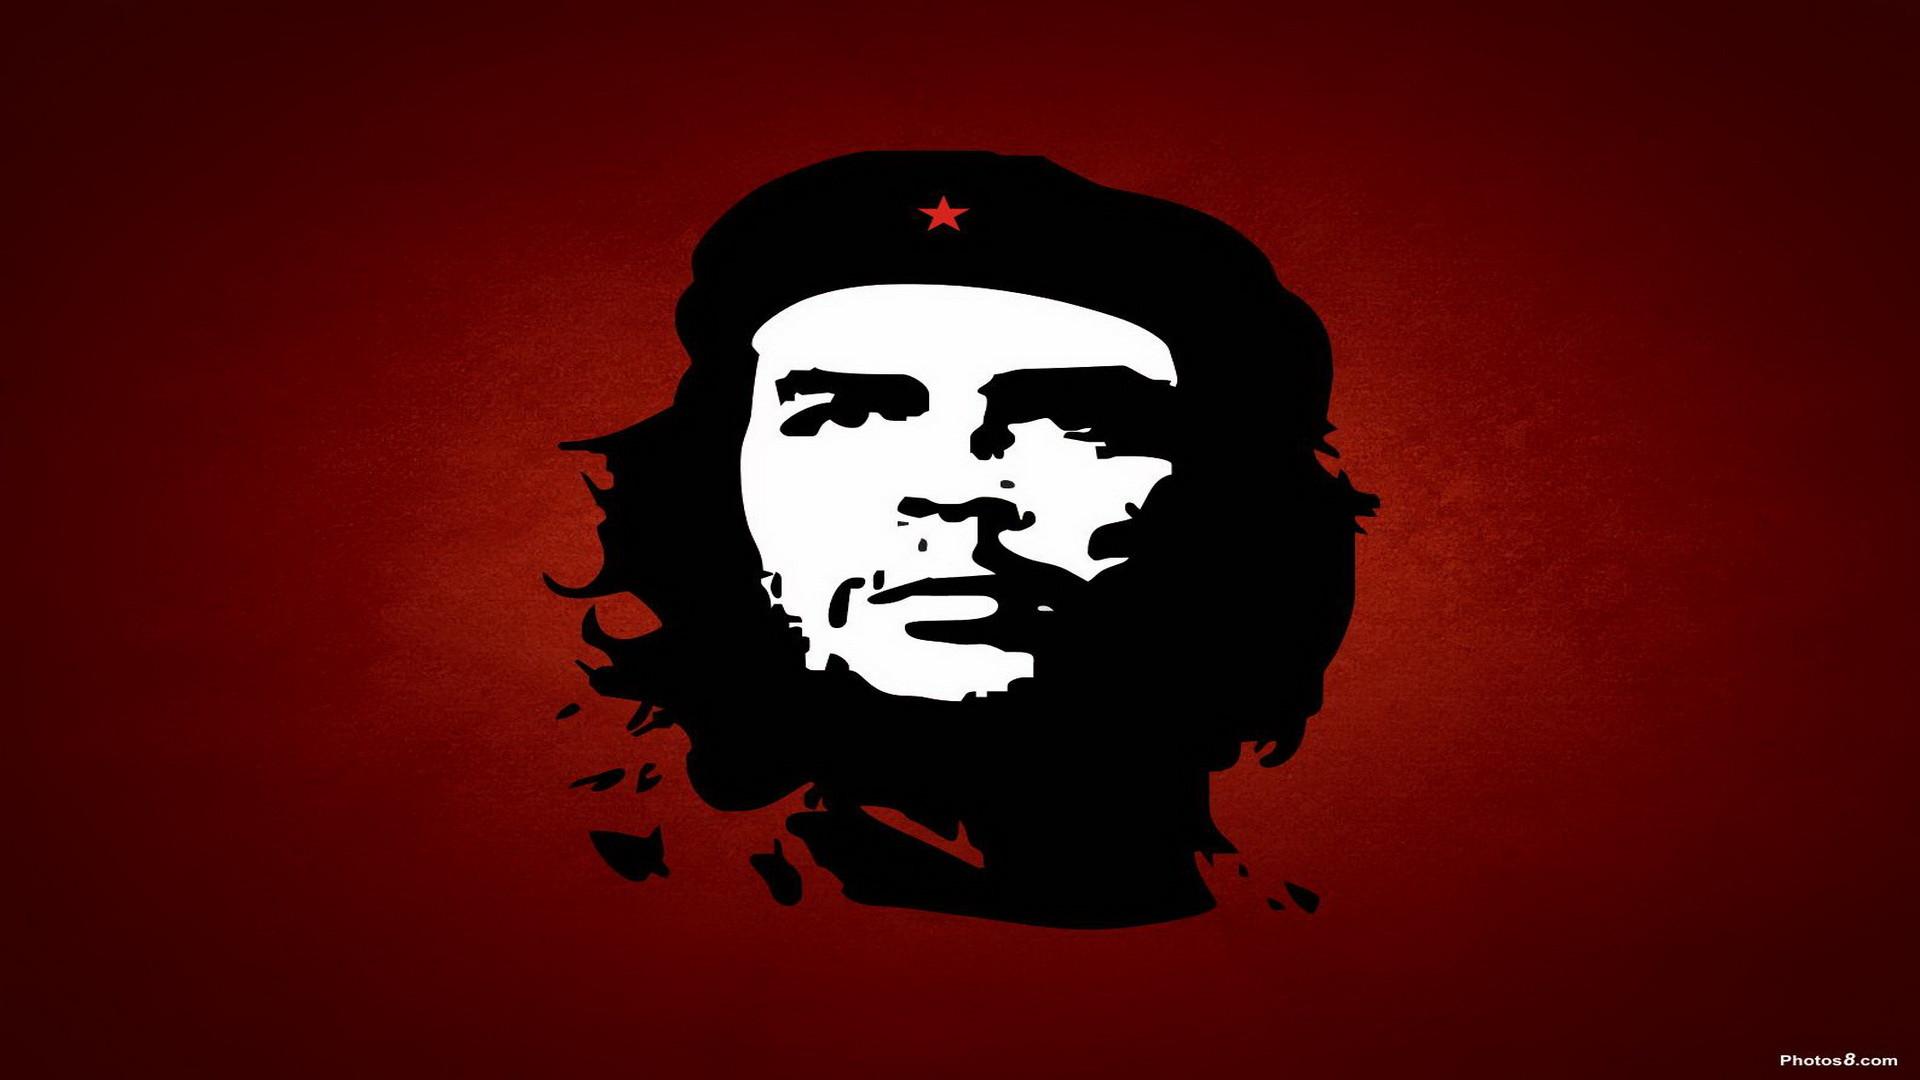 Che Guevara Wallpapers 10 | HD Desktop Wallpapers